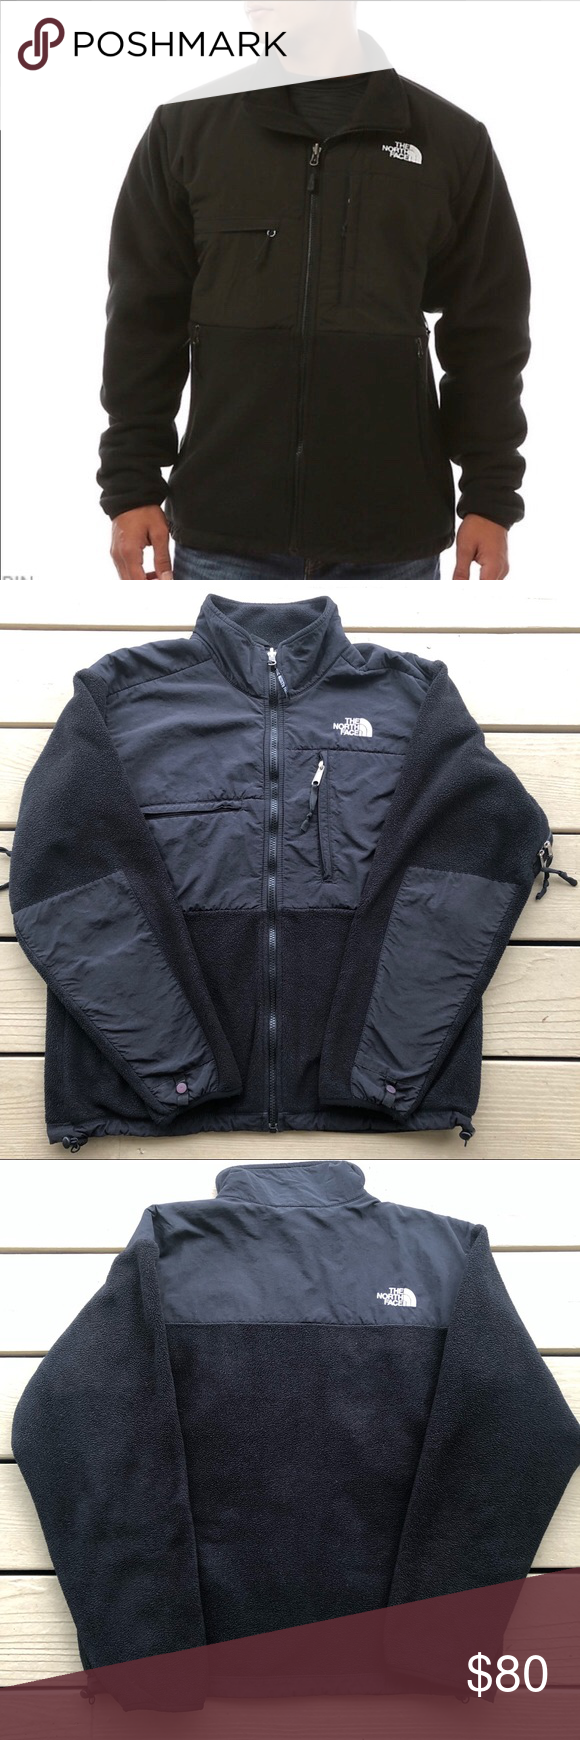 The North Face Men S 95 Retro Denali Jacket Small North Face Mens Clothes Design Fashion [ 1740 x 580 Pixel ]